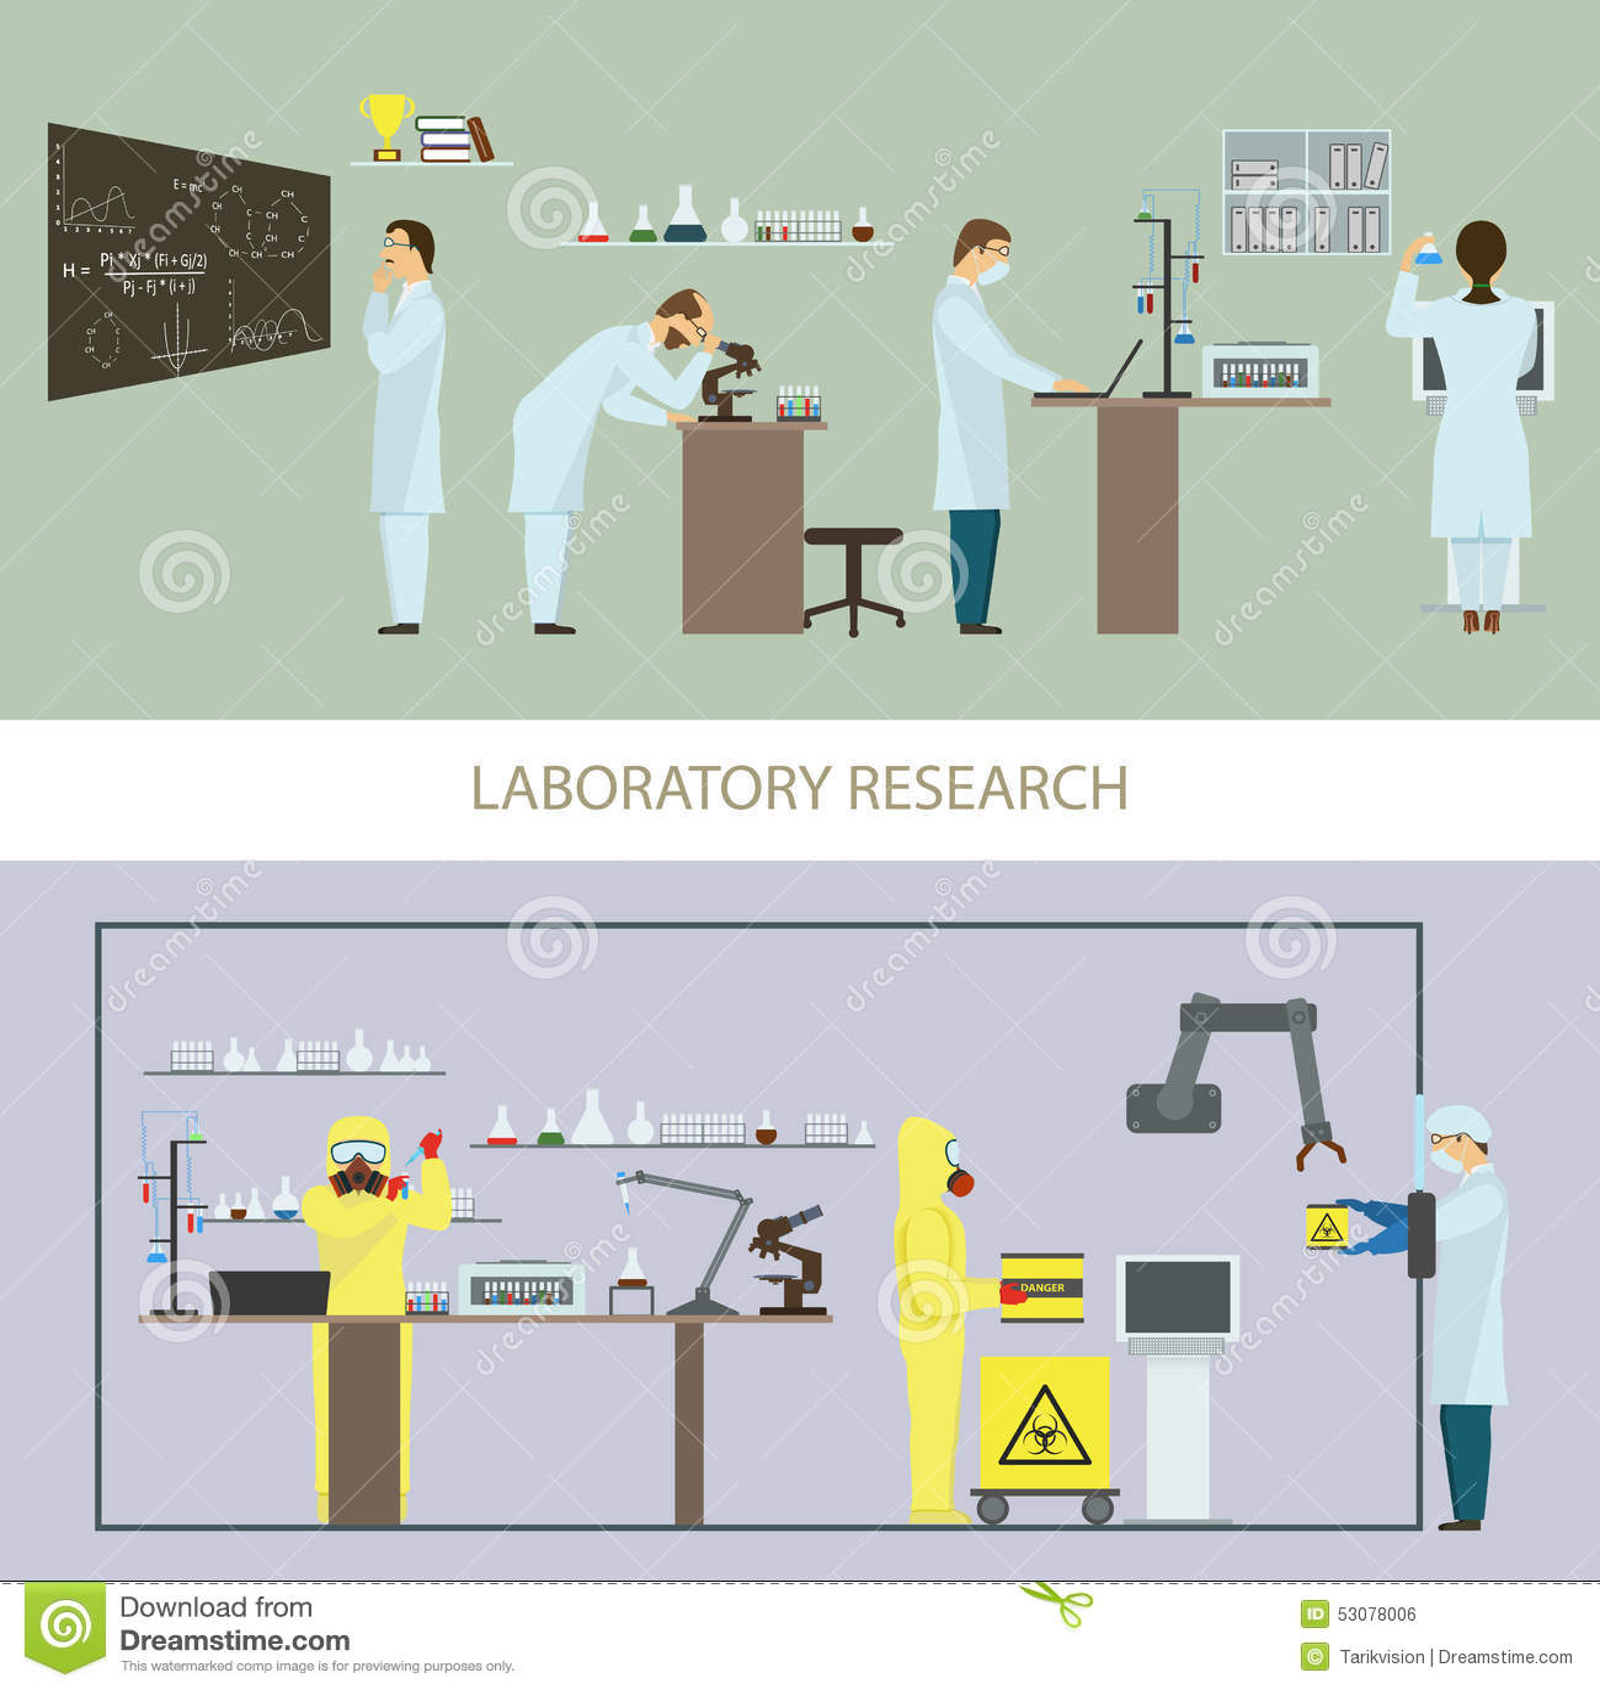 Laborforschung durch Gruppe Wissenschaftler